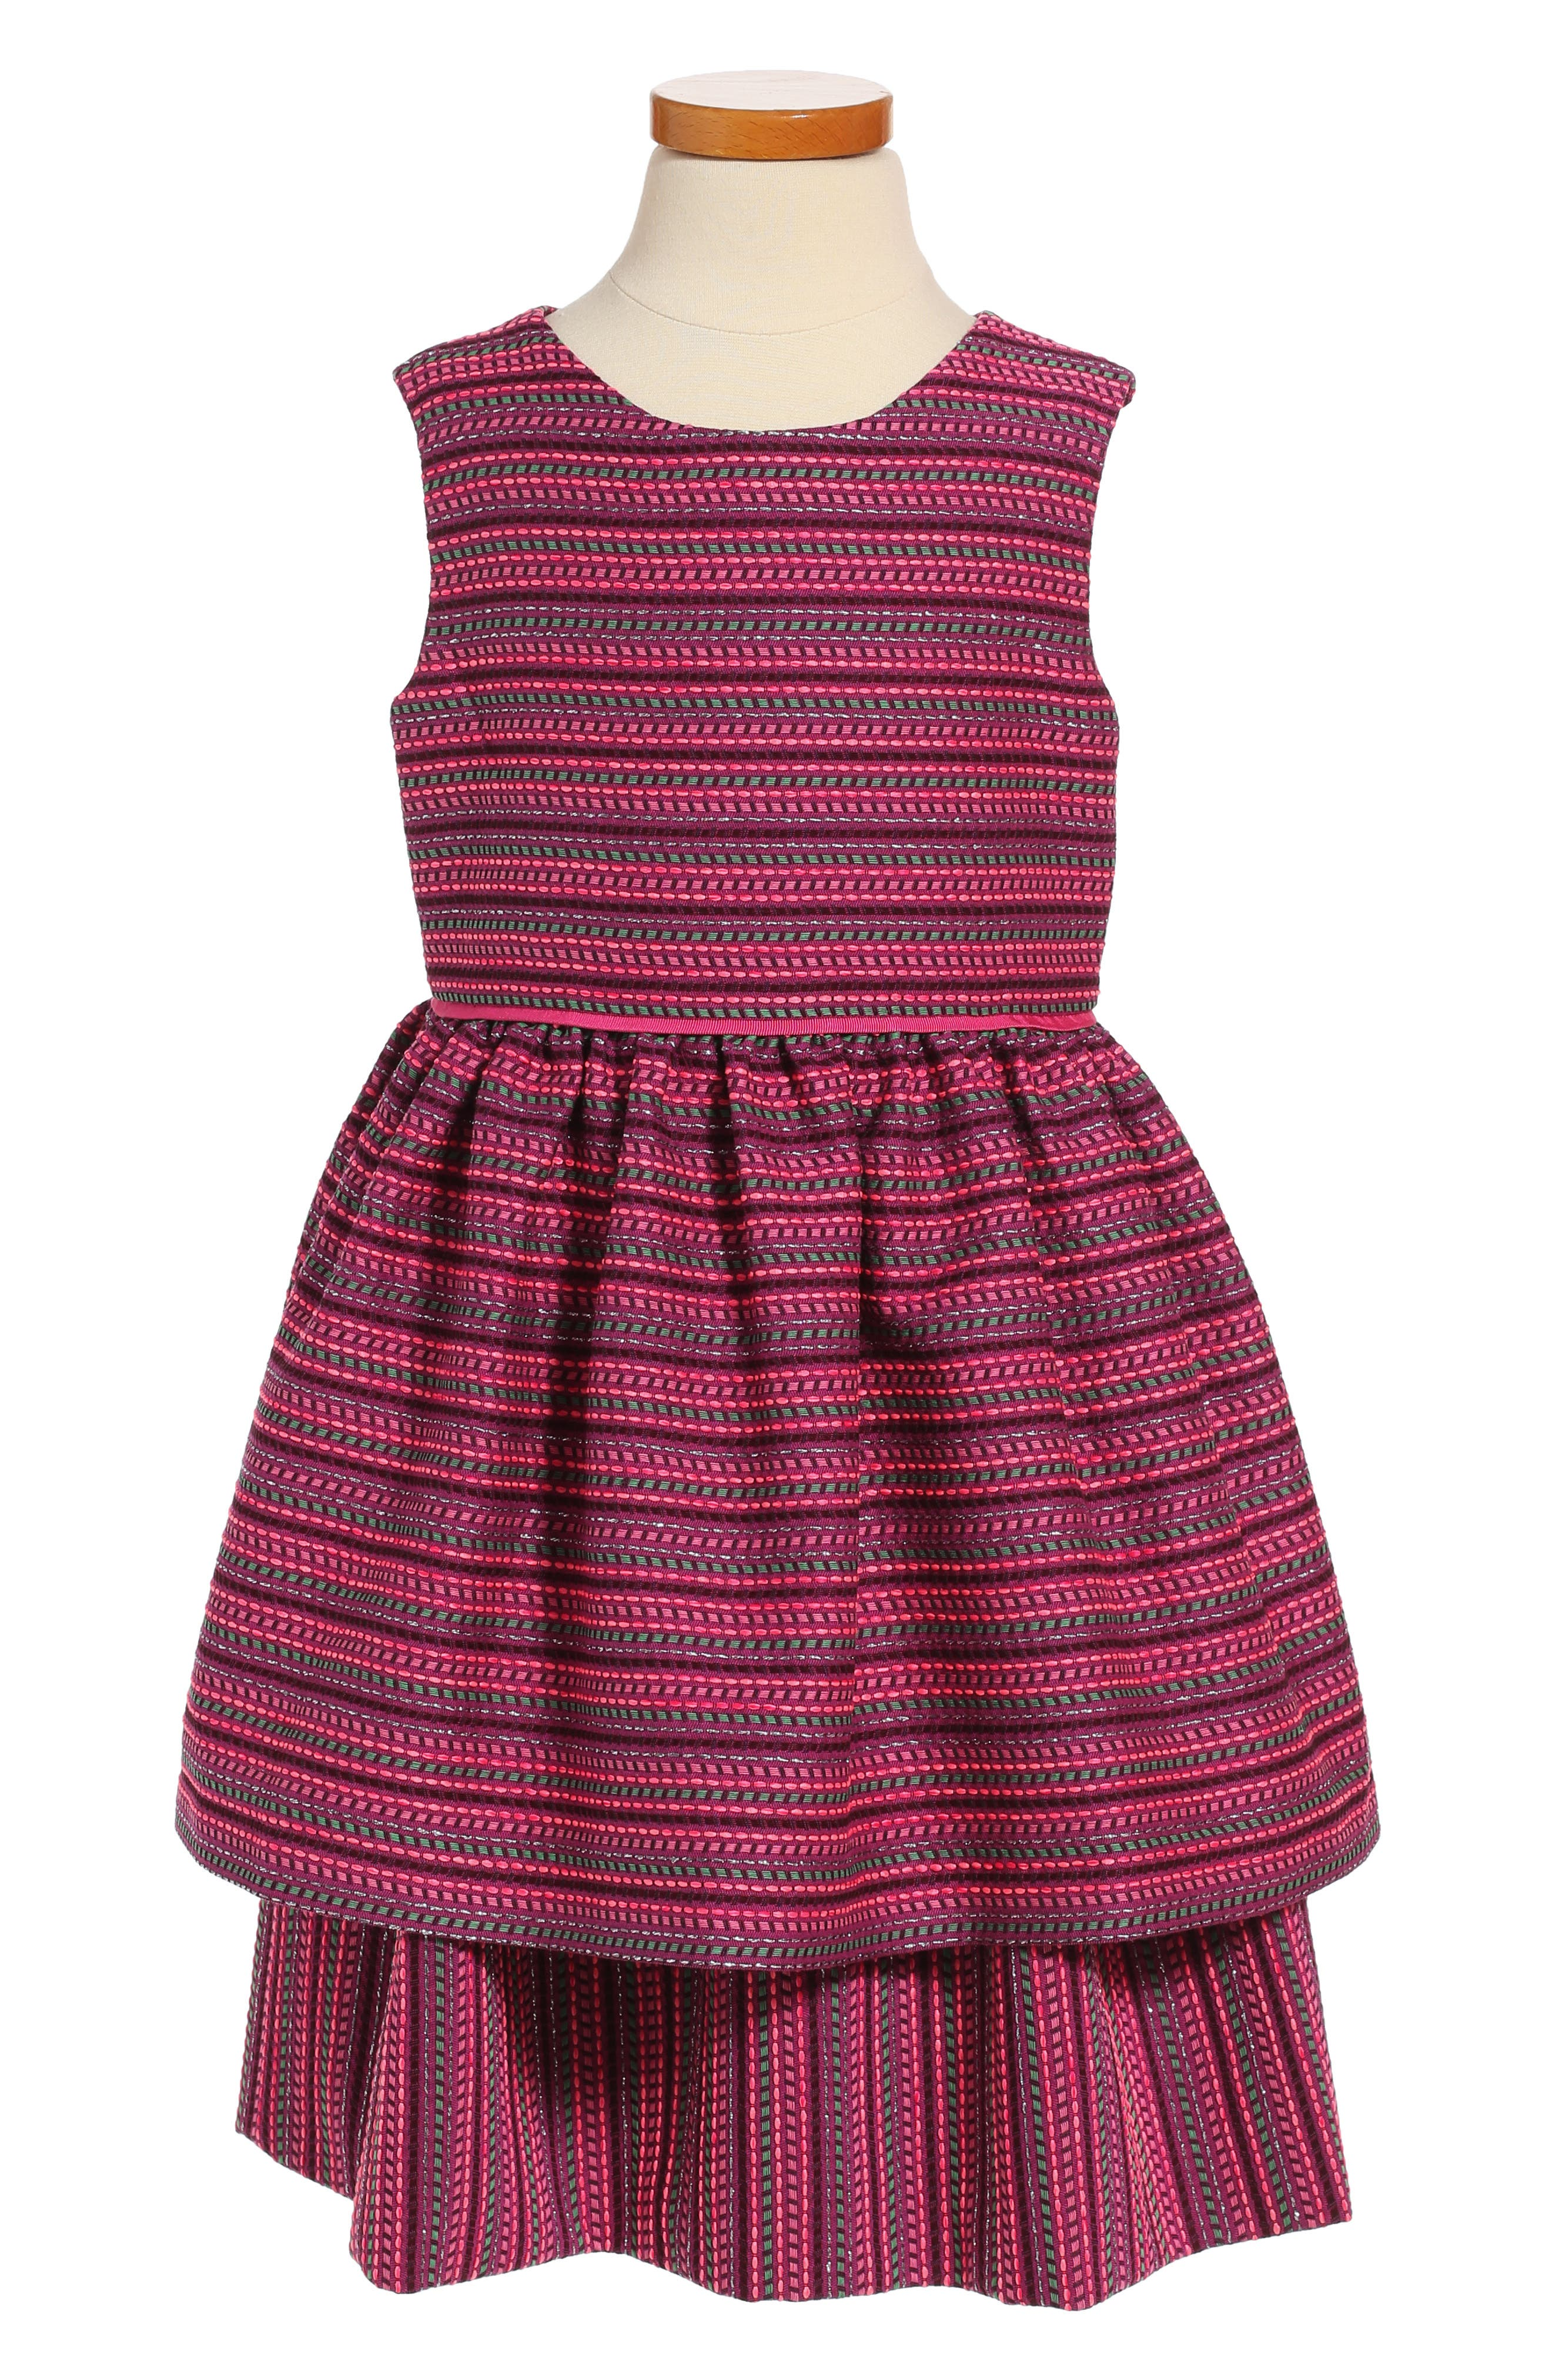 Tiered Sleeveless Dress,                         Main,                         color,